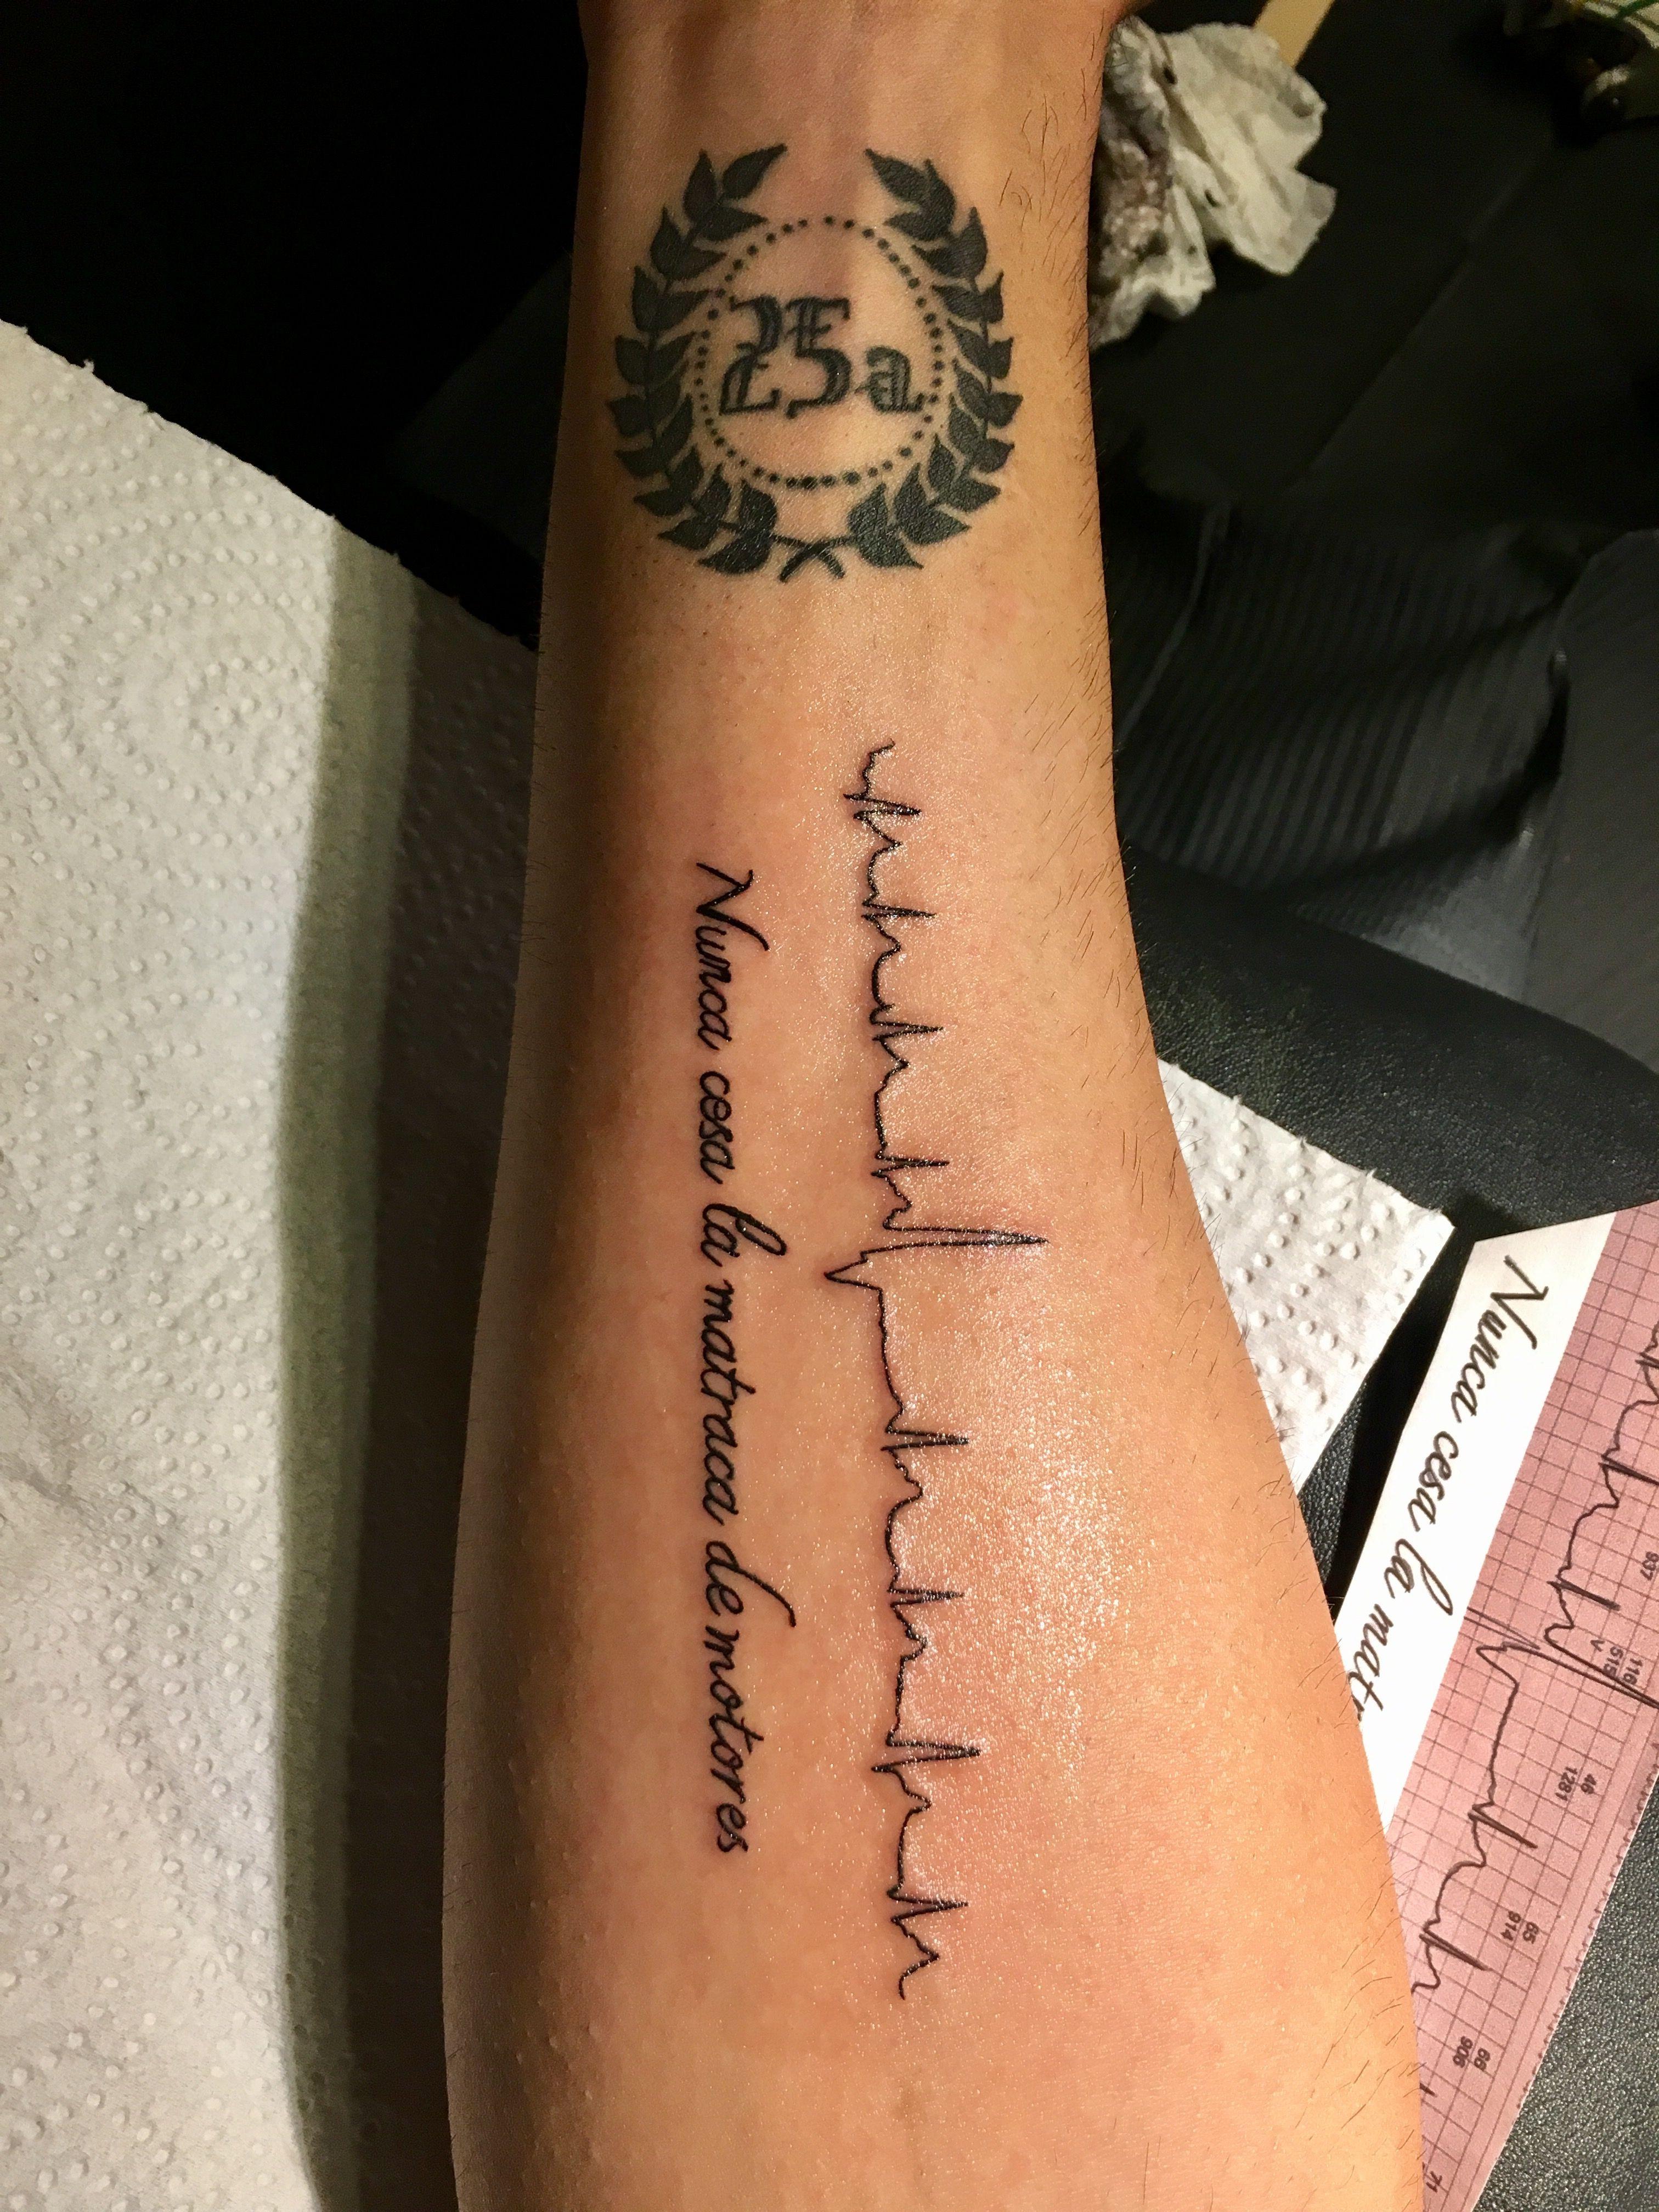 Tatuaje Antebrazo Línea De La Vida Electrocardiograma Arritmia